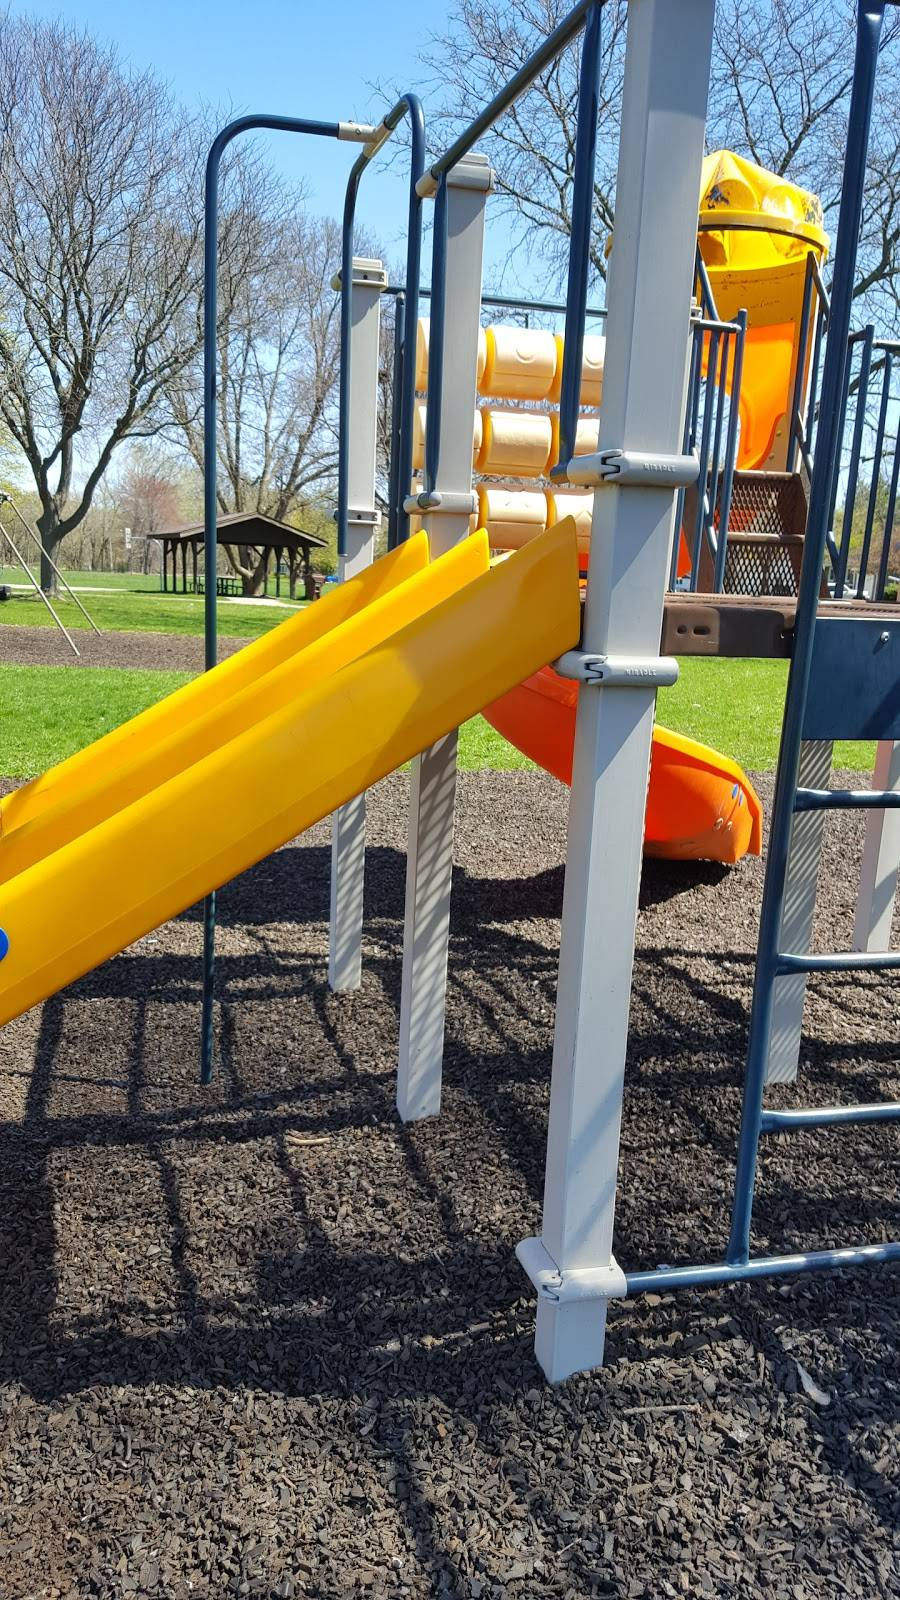 Northland Manor Park - park    Photo 8 of 8   Address: Northland Manor Park, Madison, WI 53704, USA   Phone: (608) 266-4711